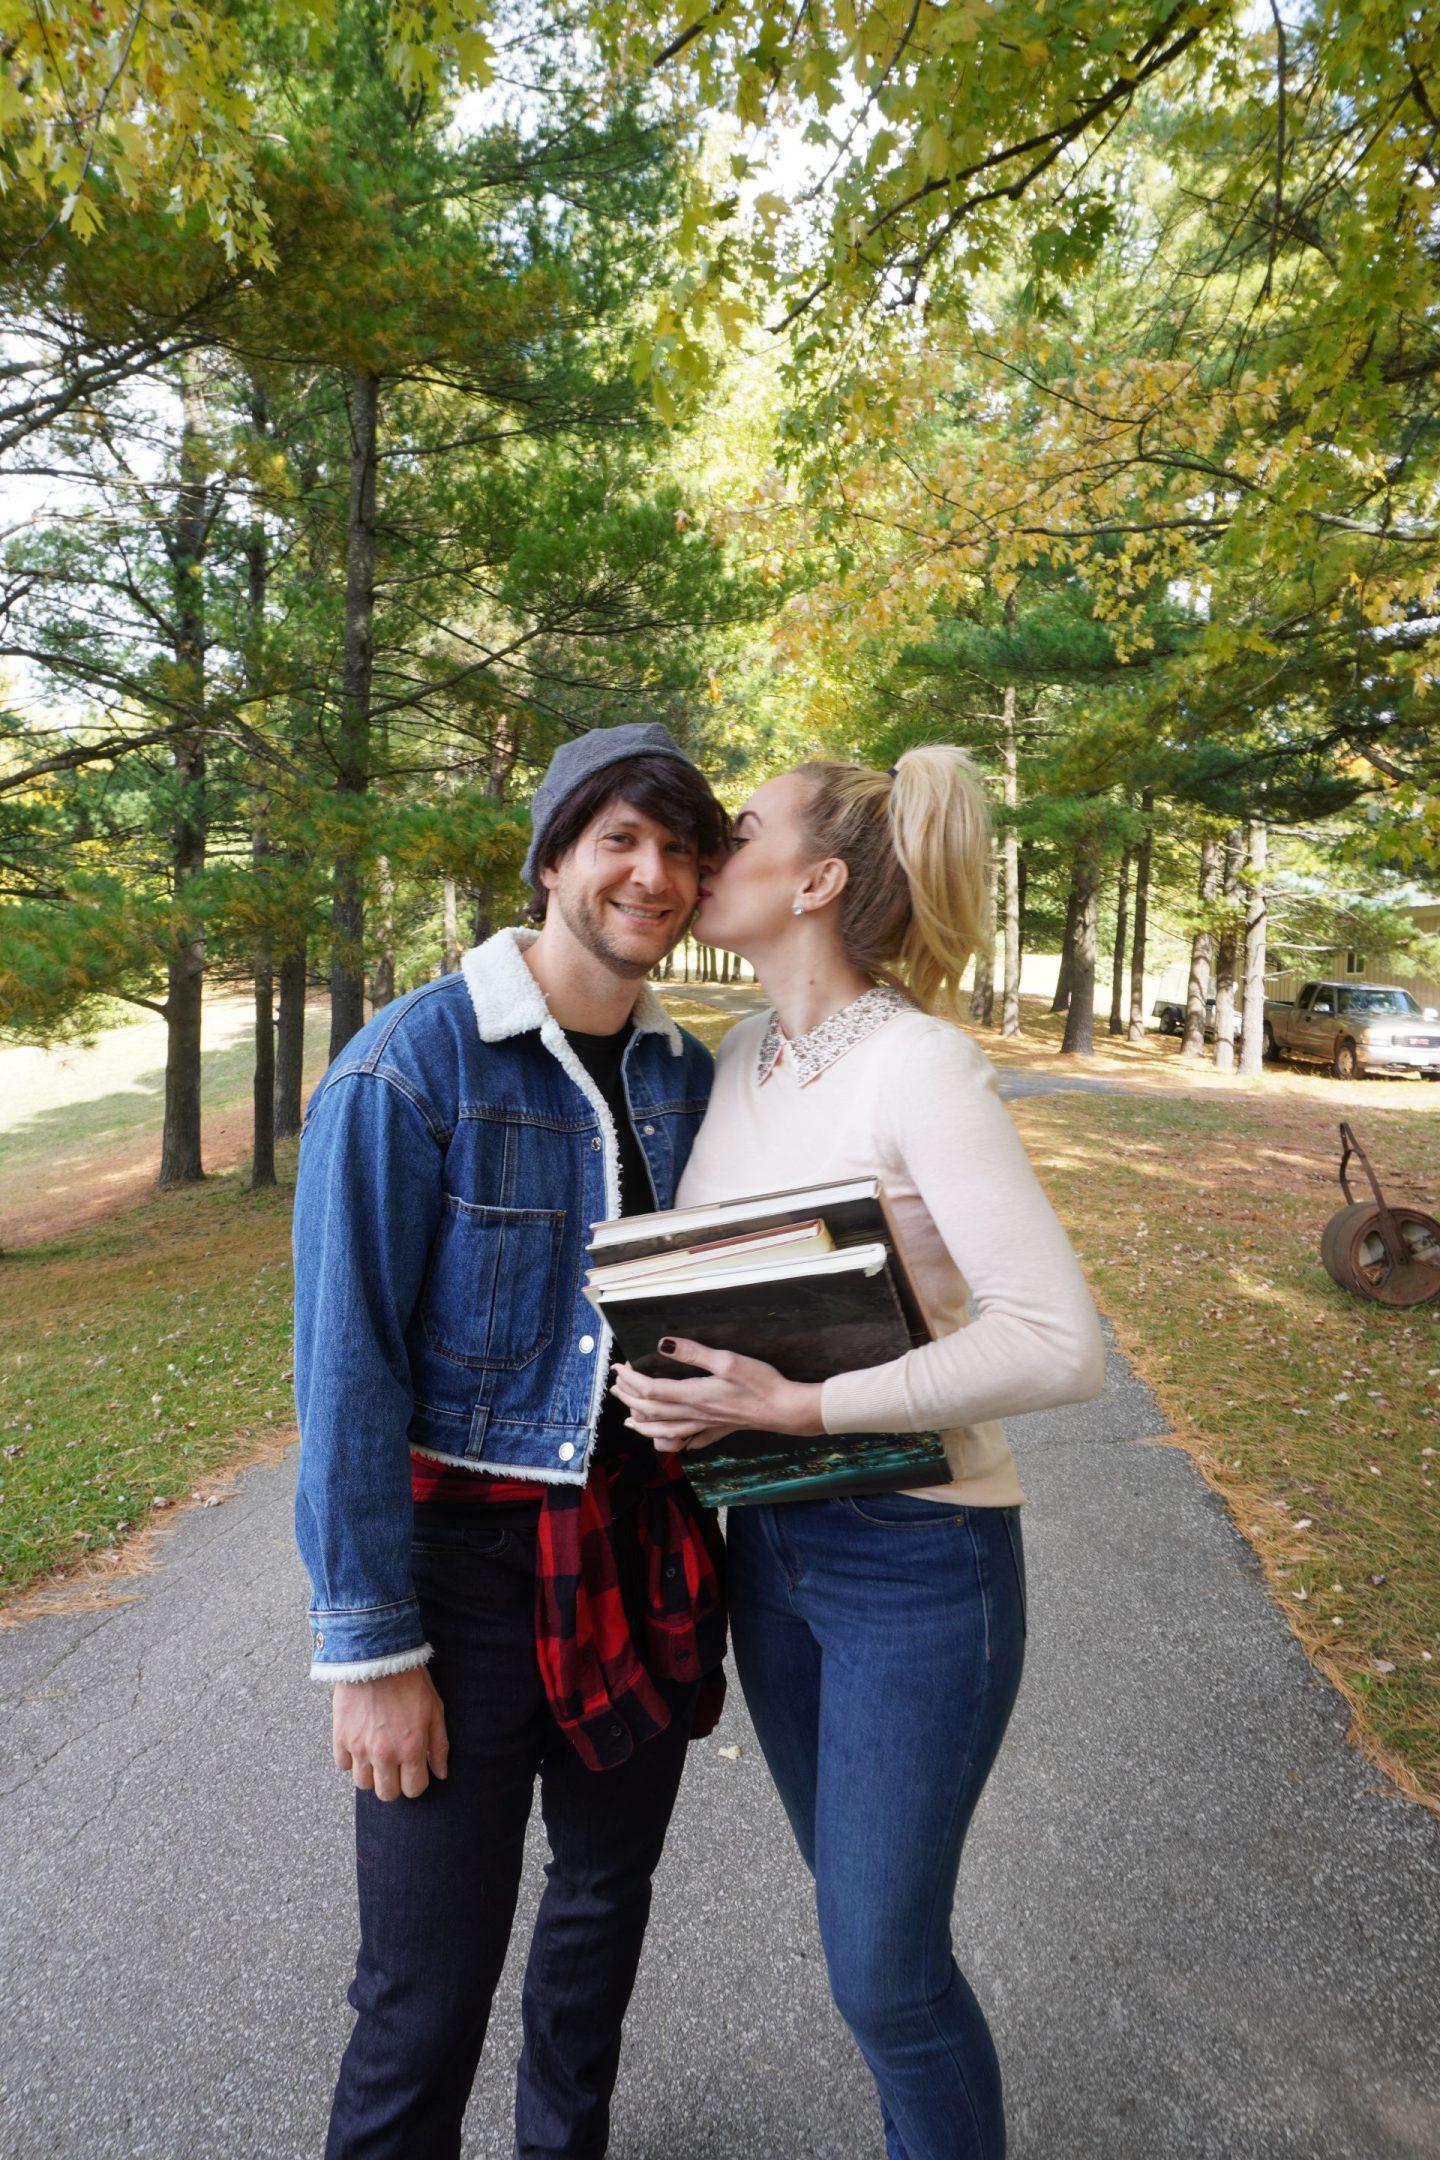 betty and jughead couples halloween costume idea